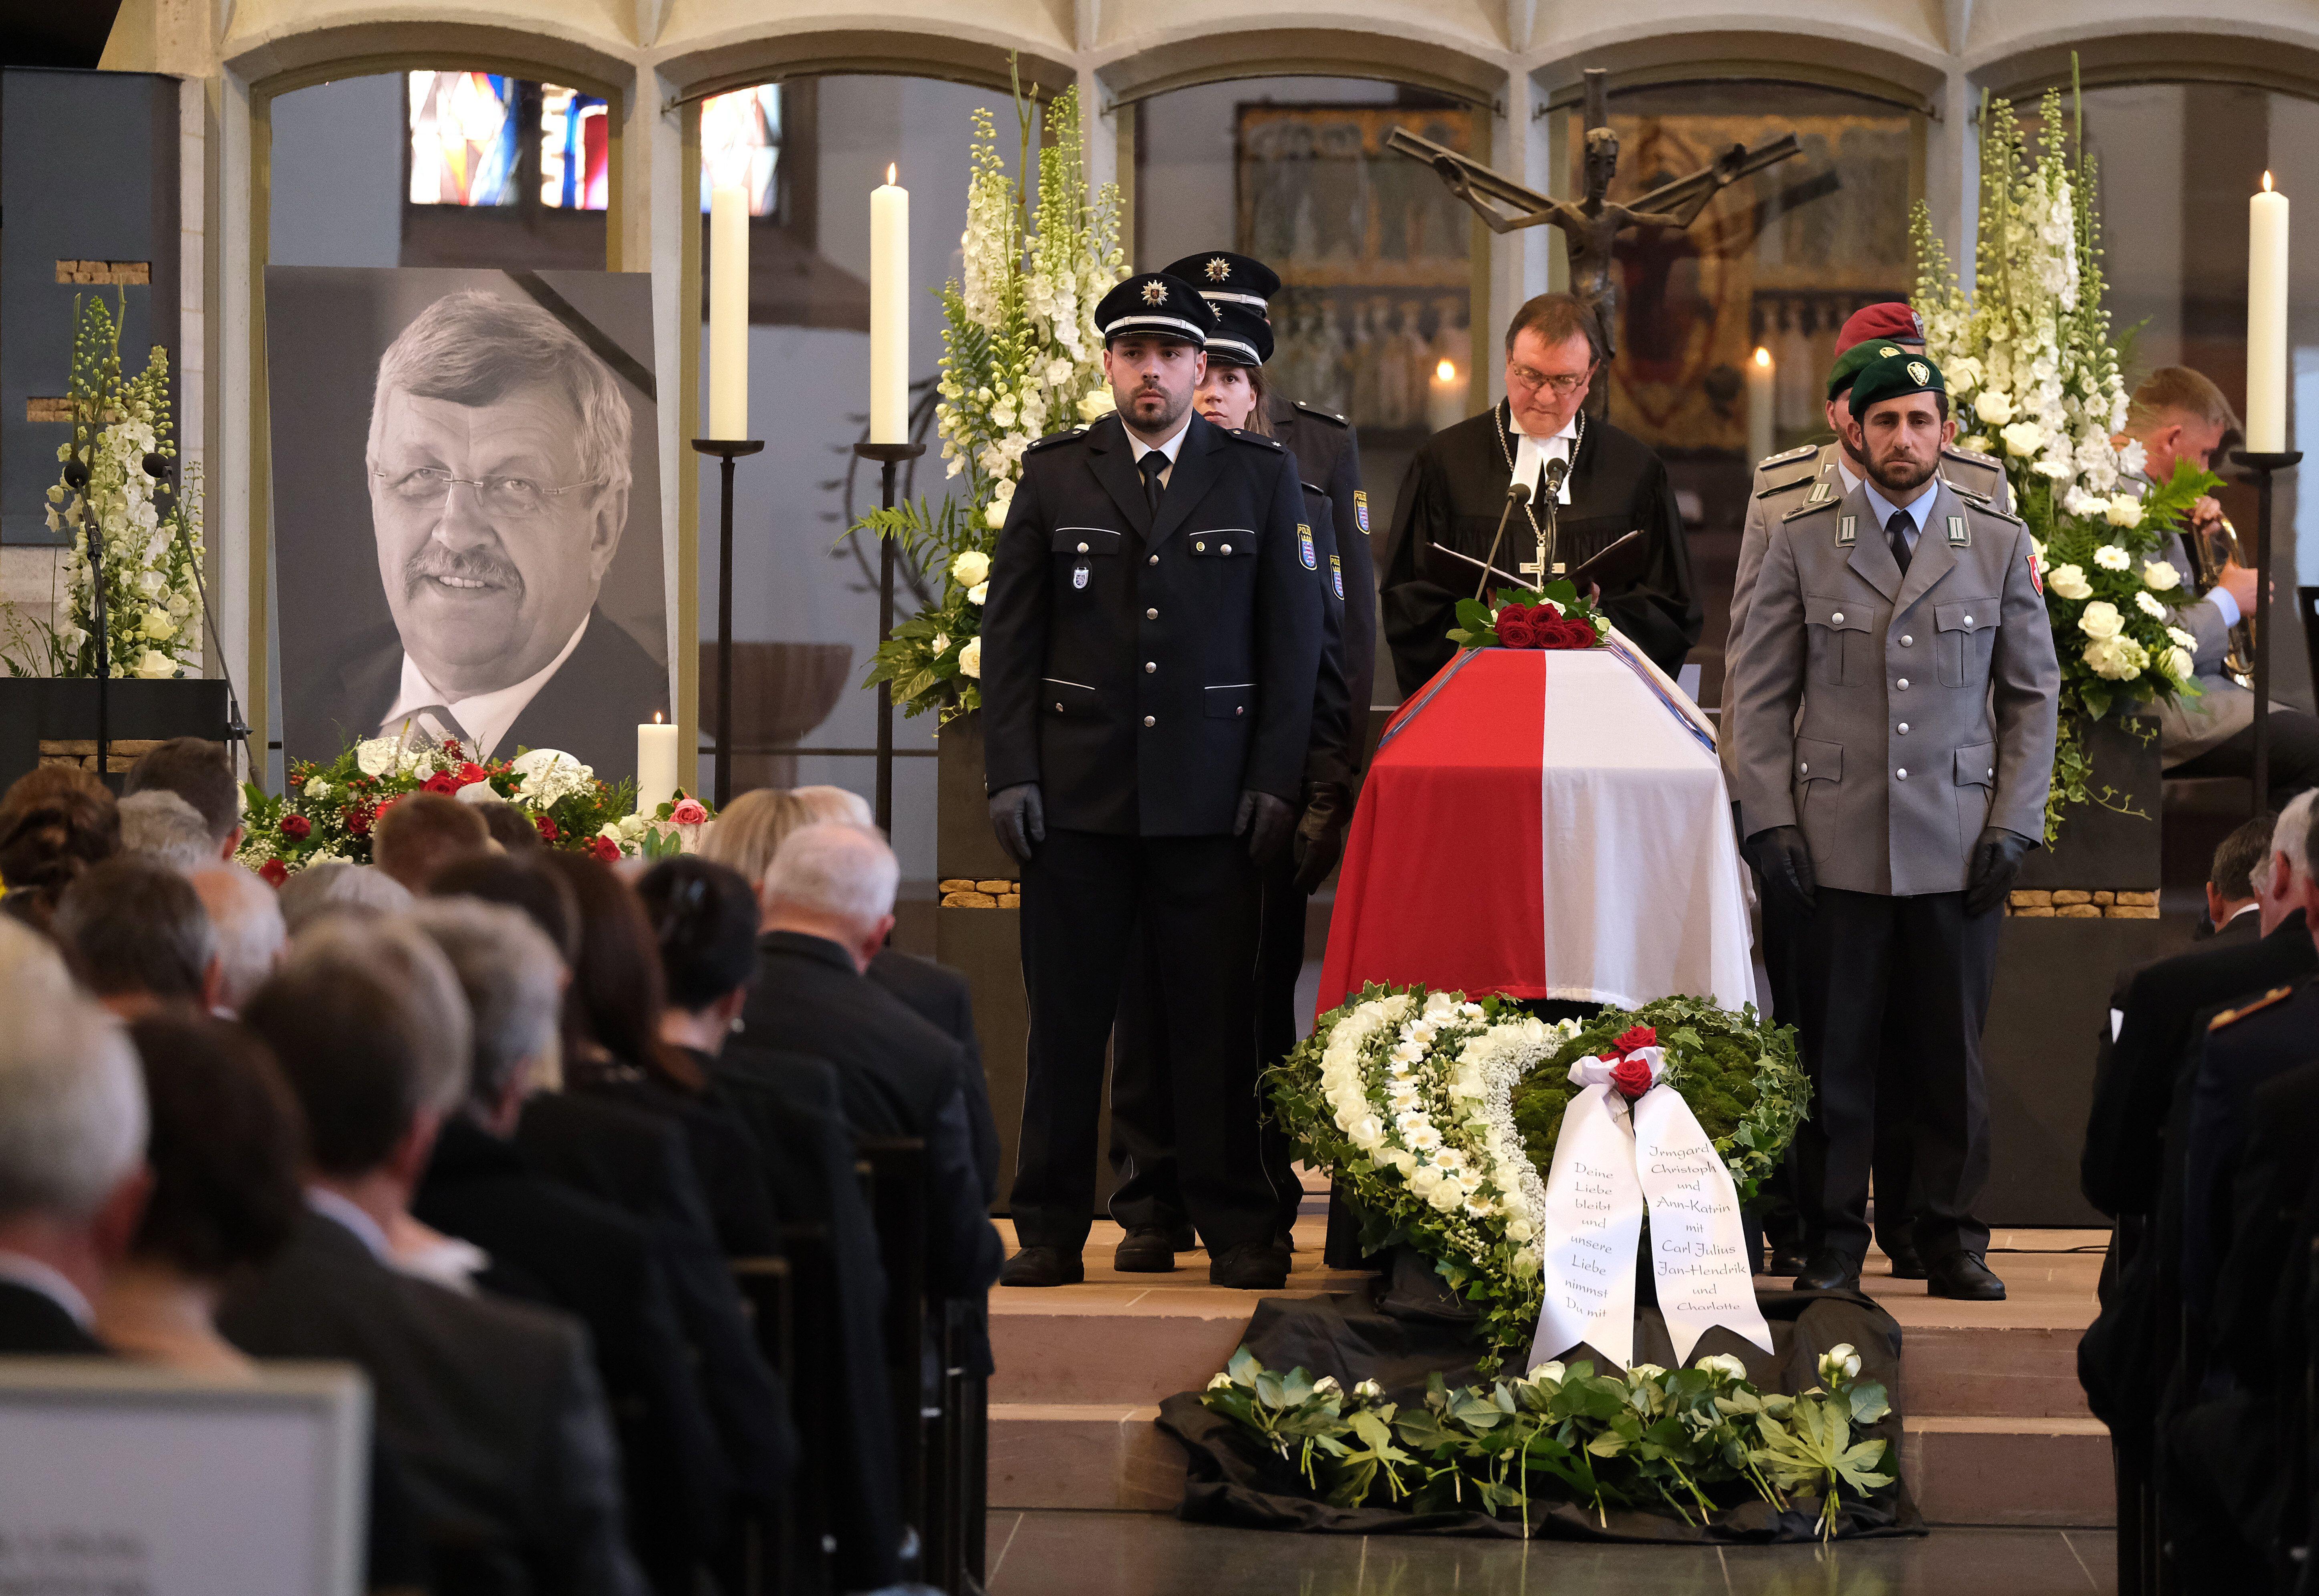 Bishop Martin Hein speaks during a memorial service for murdered German politician Walter Lübcke on June 13, 2019, in Ka